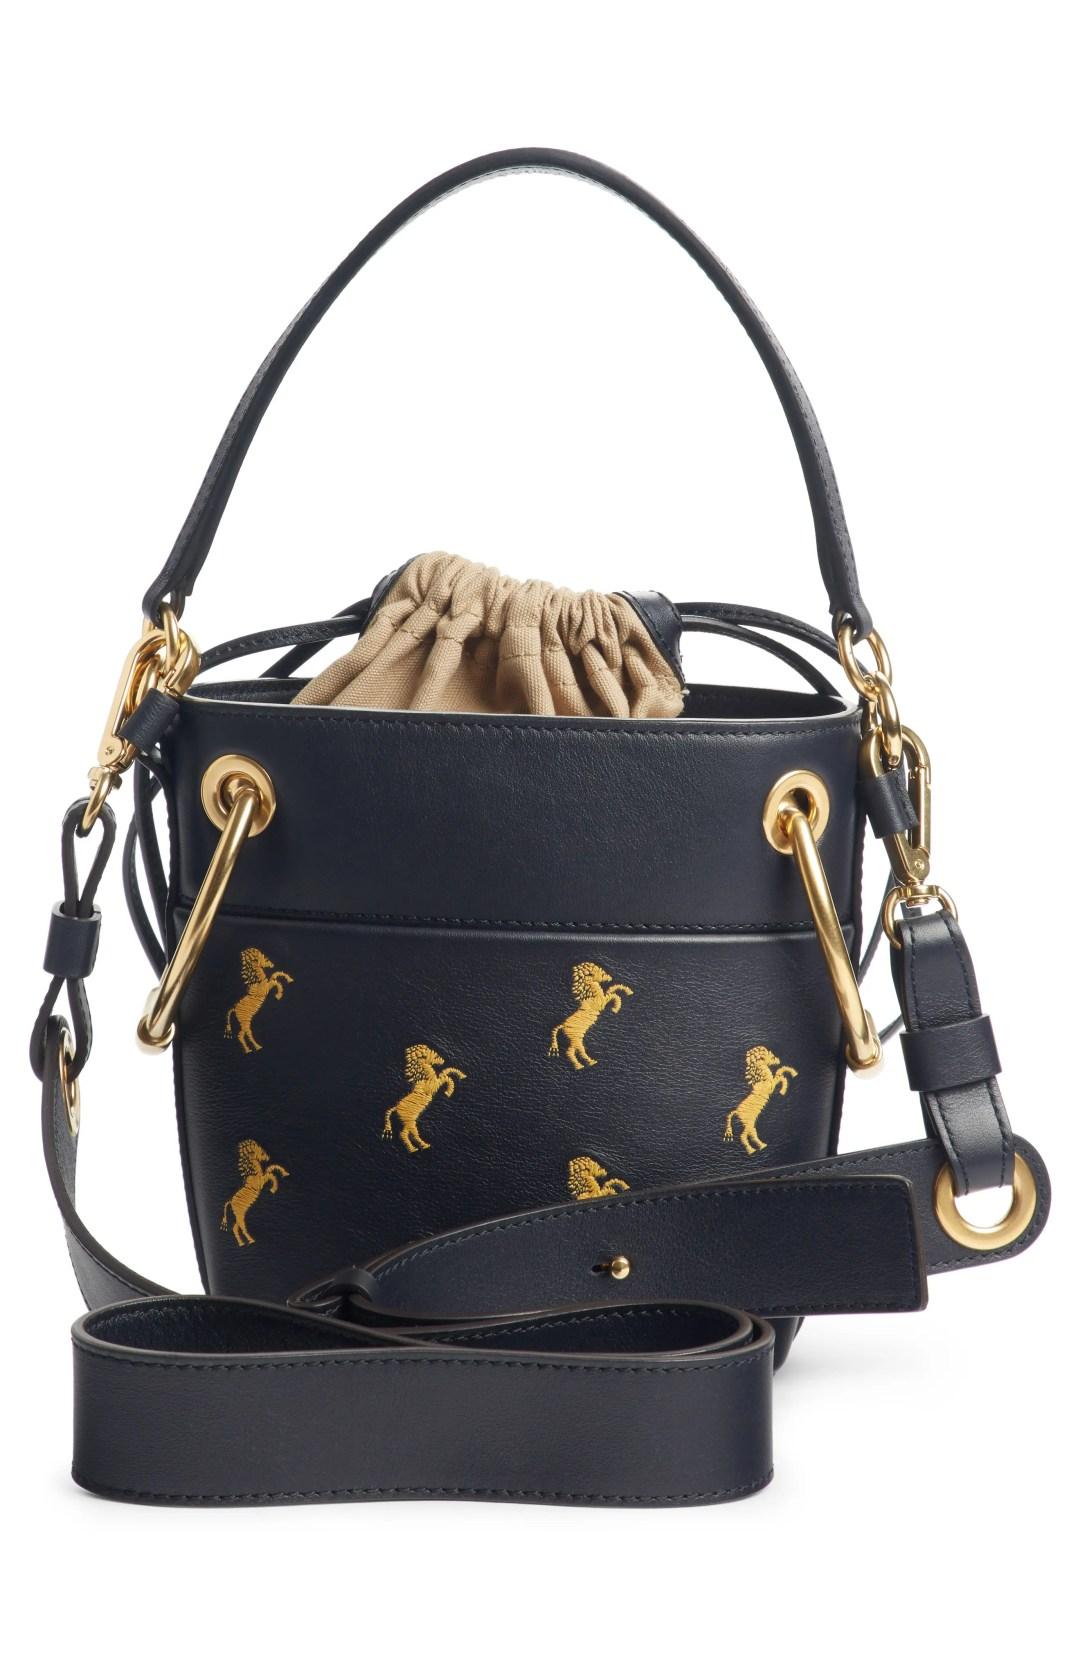 Chloé Roy Mini Embroidered Leather Bucket Bag 715a5794ab